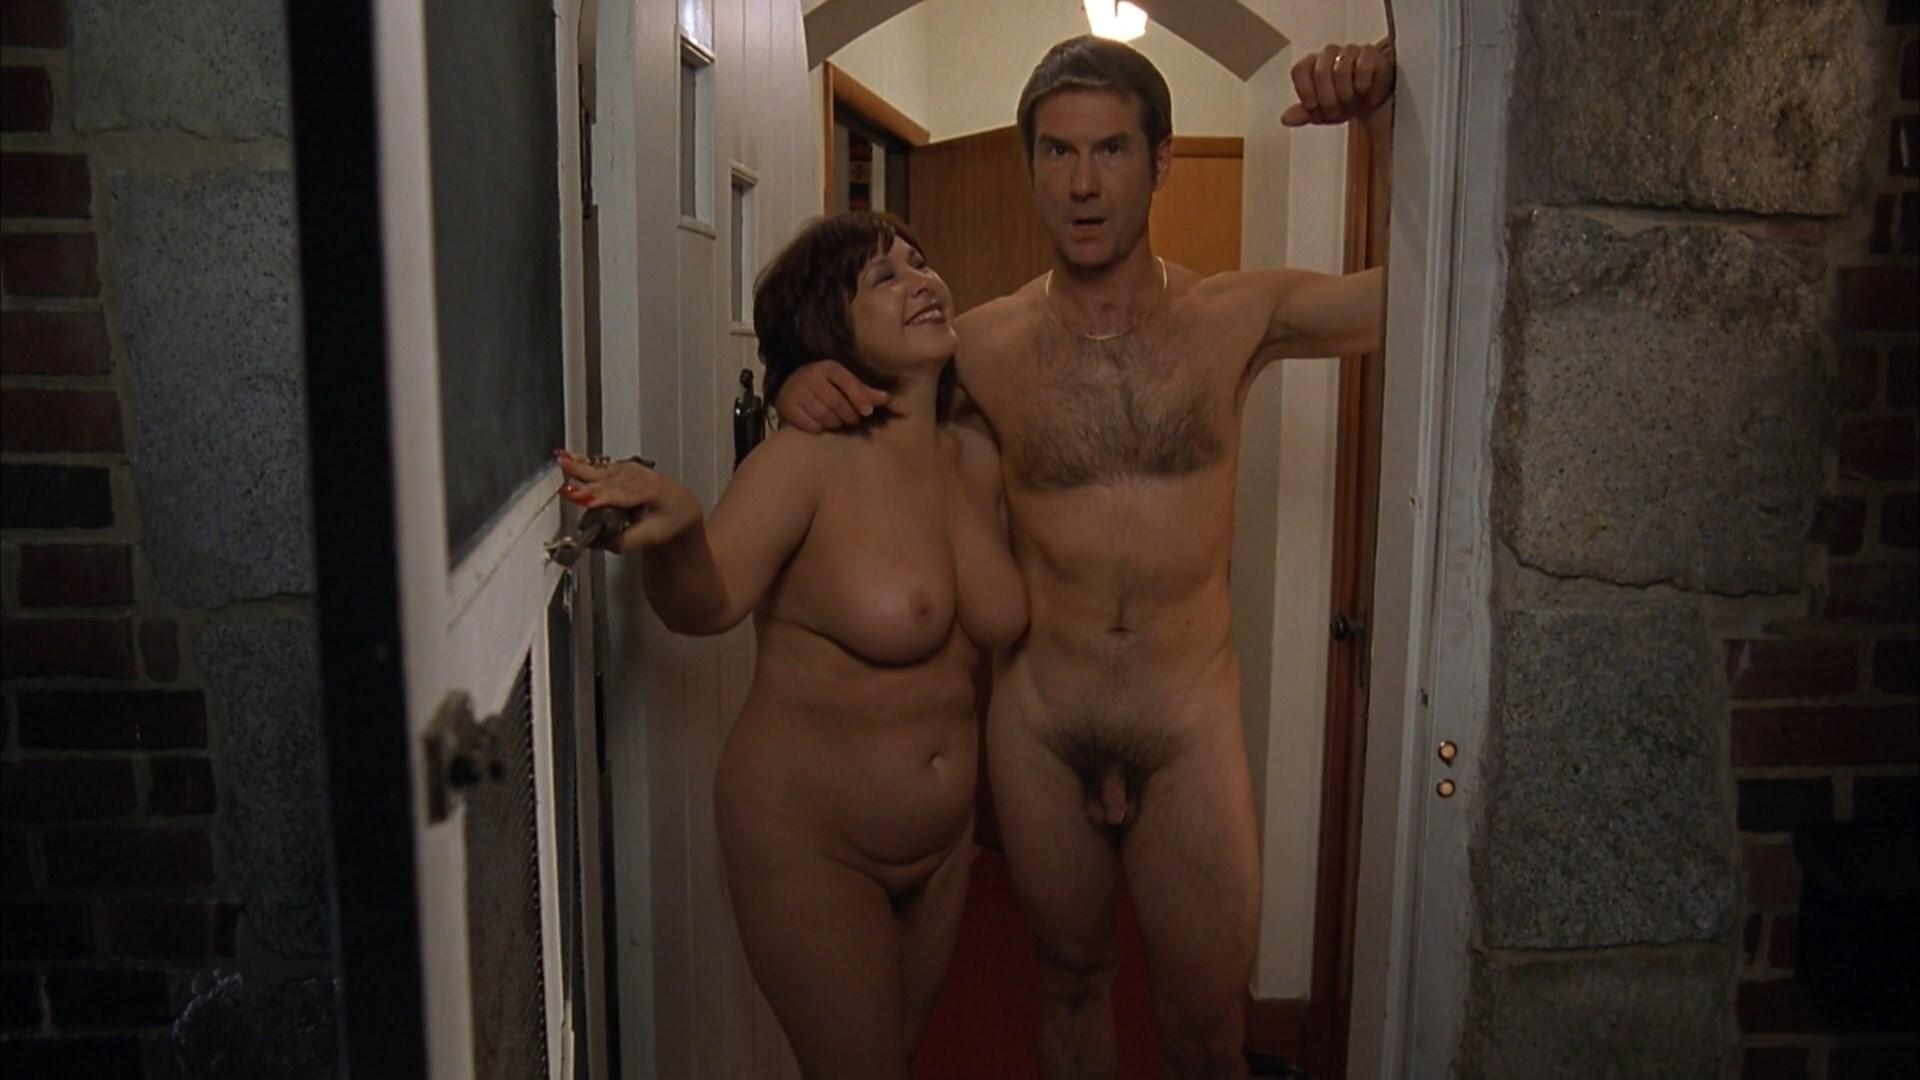 Susan Allenback nude - A Dirty Shame (2004)